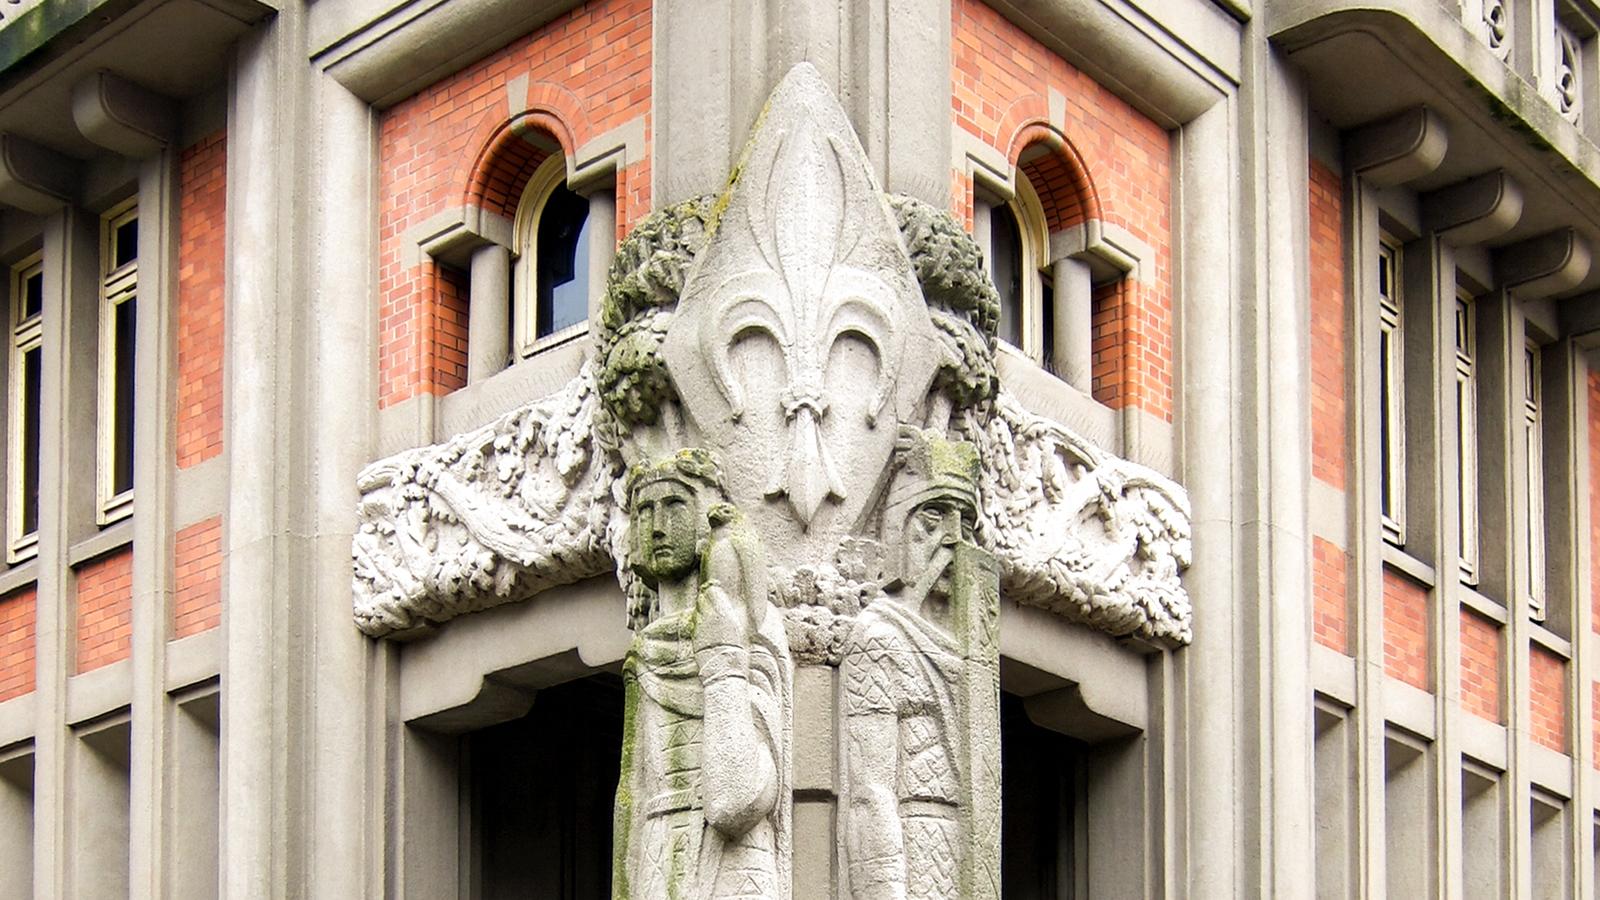 Lyderic et Phinaert geants de Lille